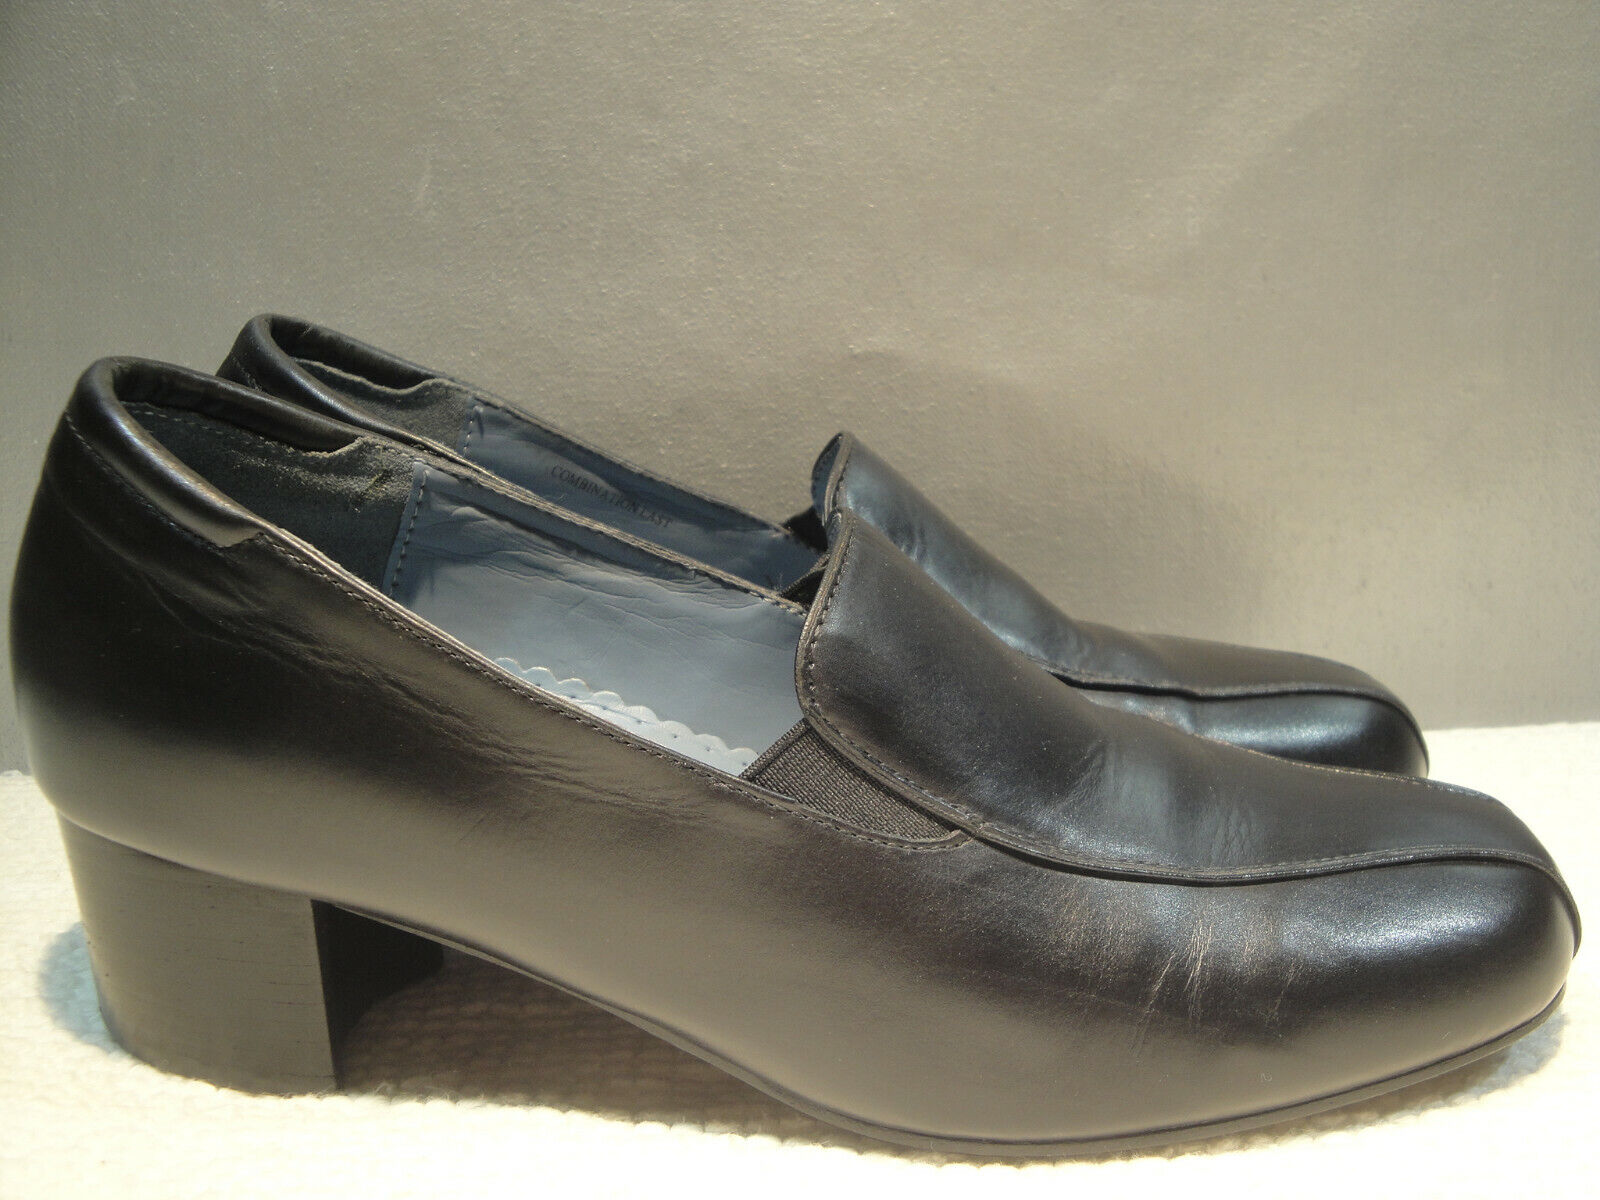 WOMENS 8 B ARAVON BLACK LEATHER COMFORT LOAFER HEELS SHOES